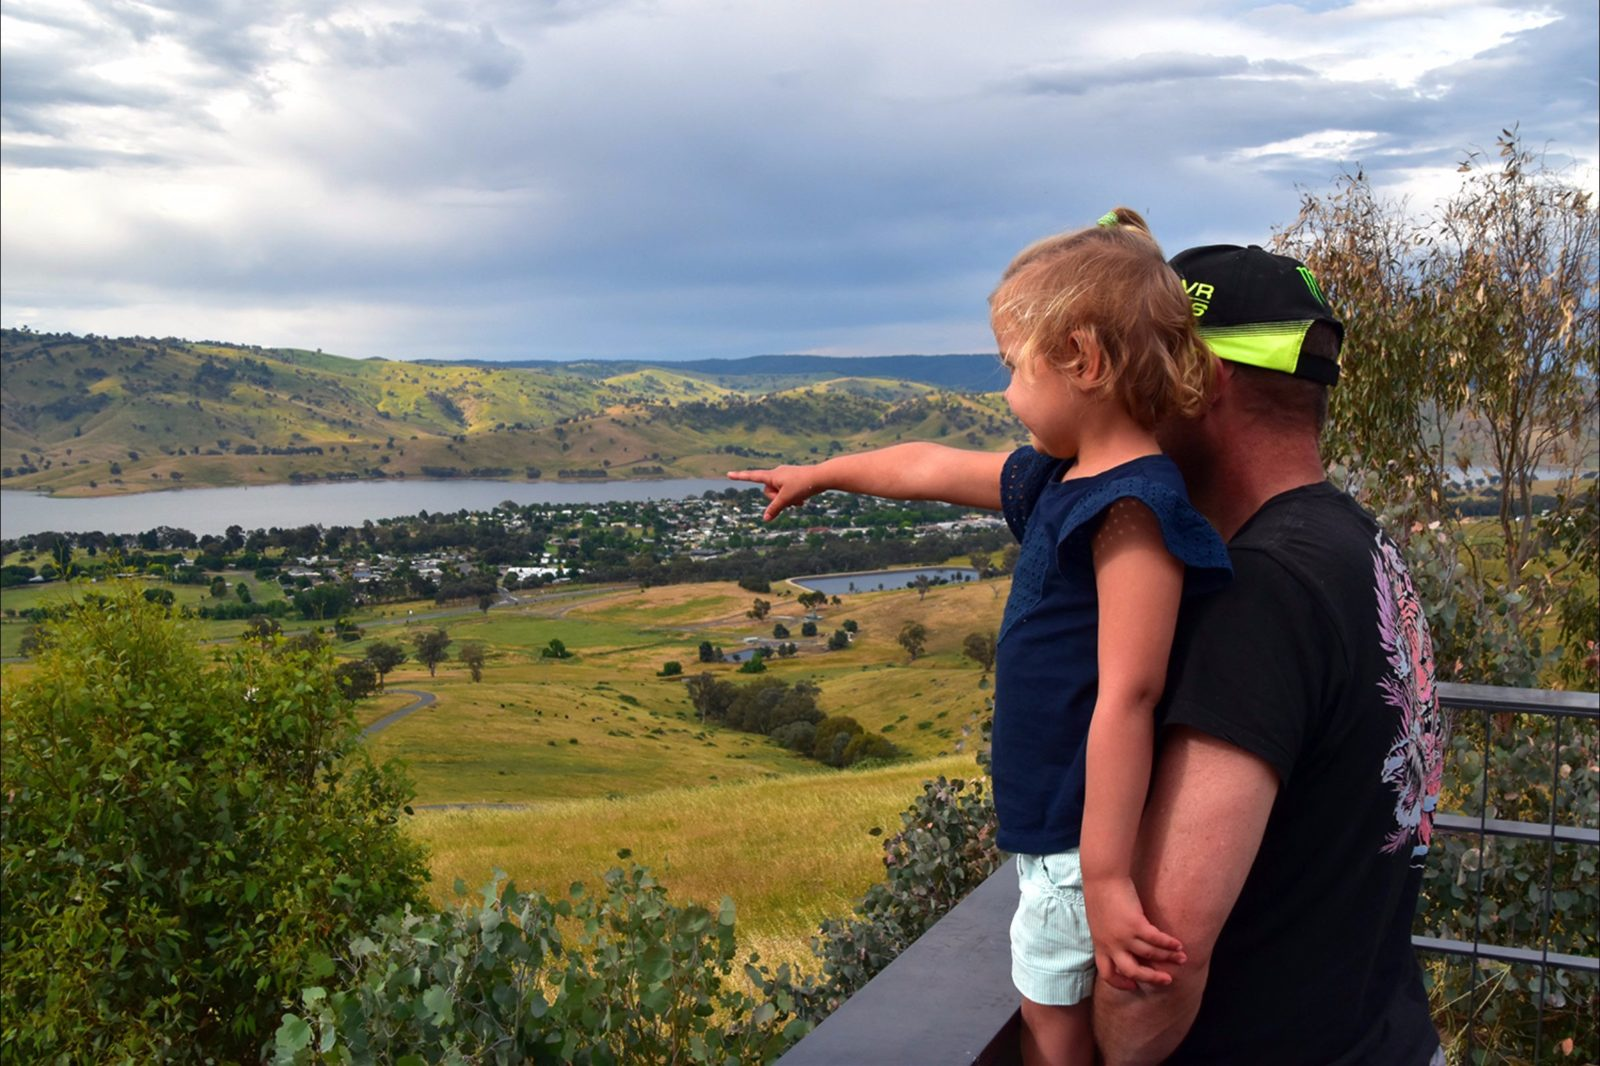 Tallangatta lookout - taking in the views